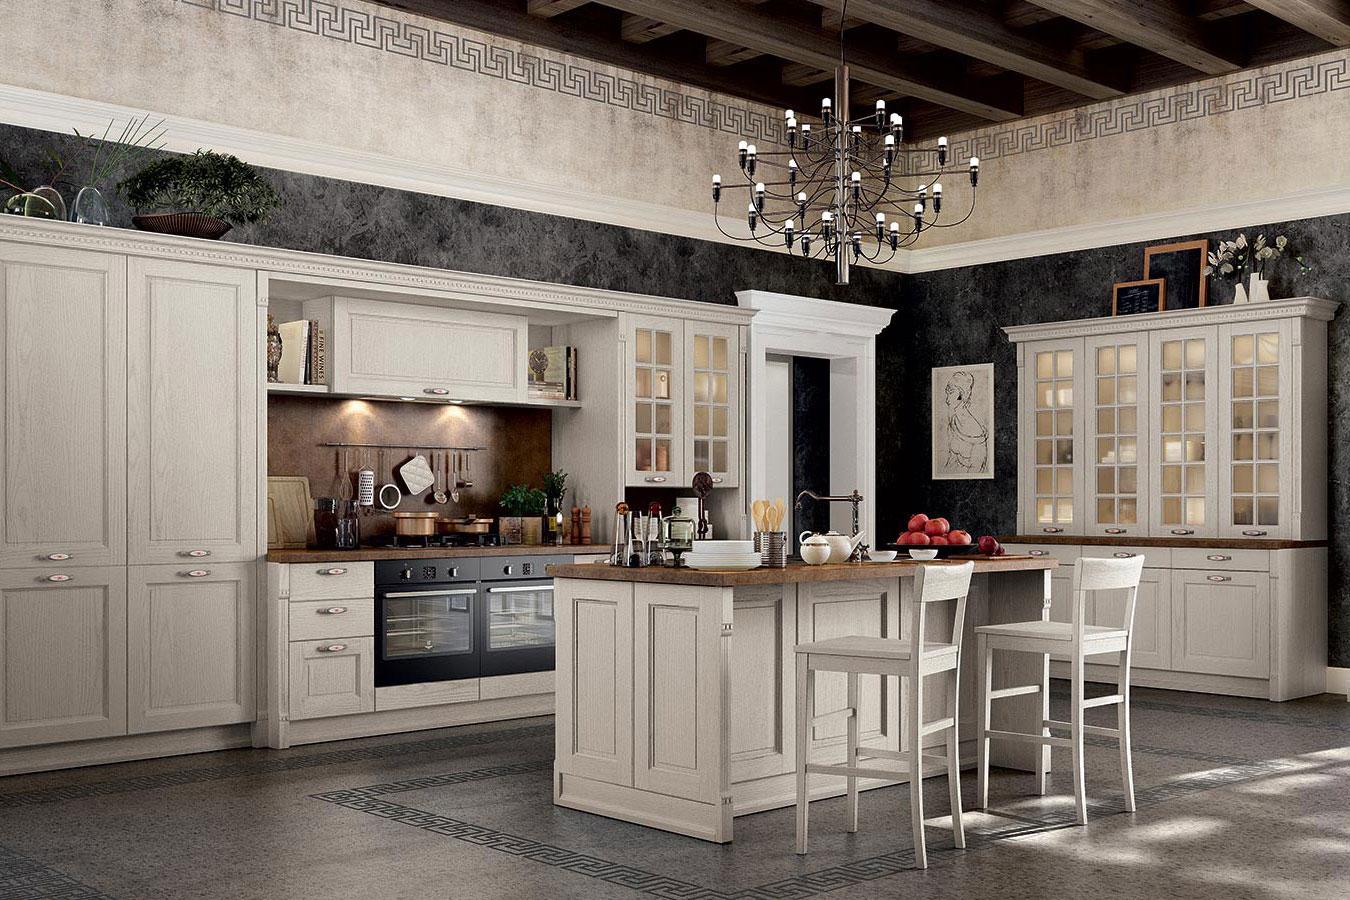 Cucina classica virginia di arredo3 righetti mobili novara for Mobili arredo cucina